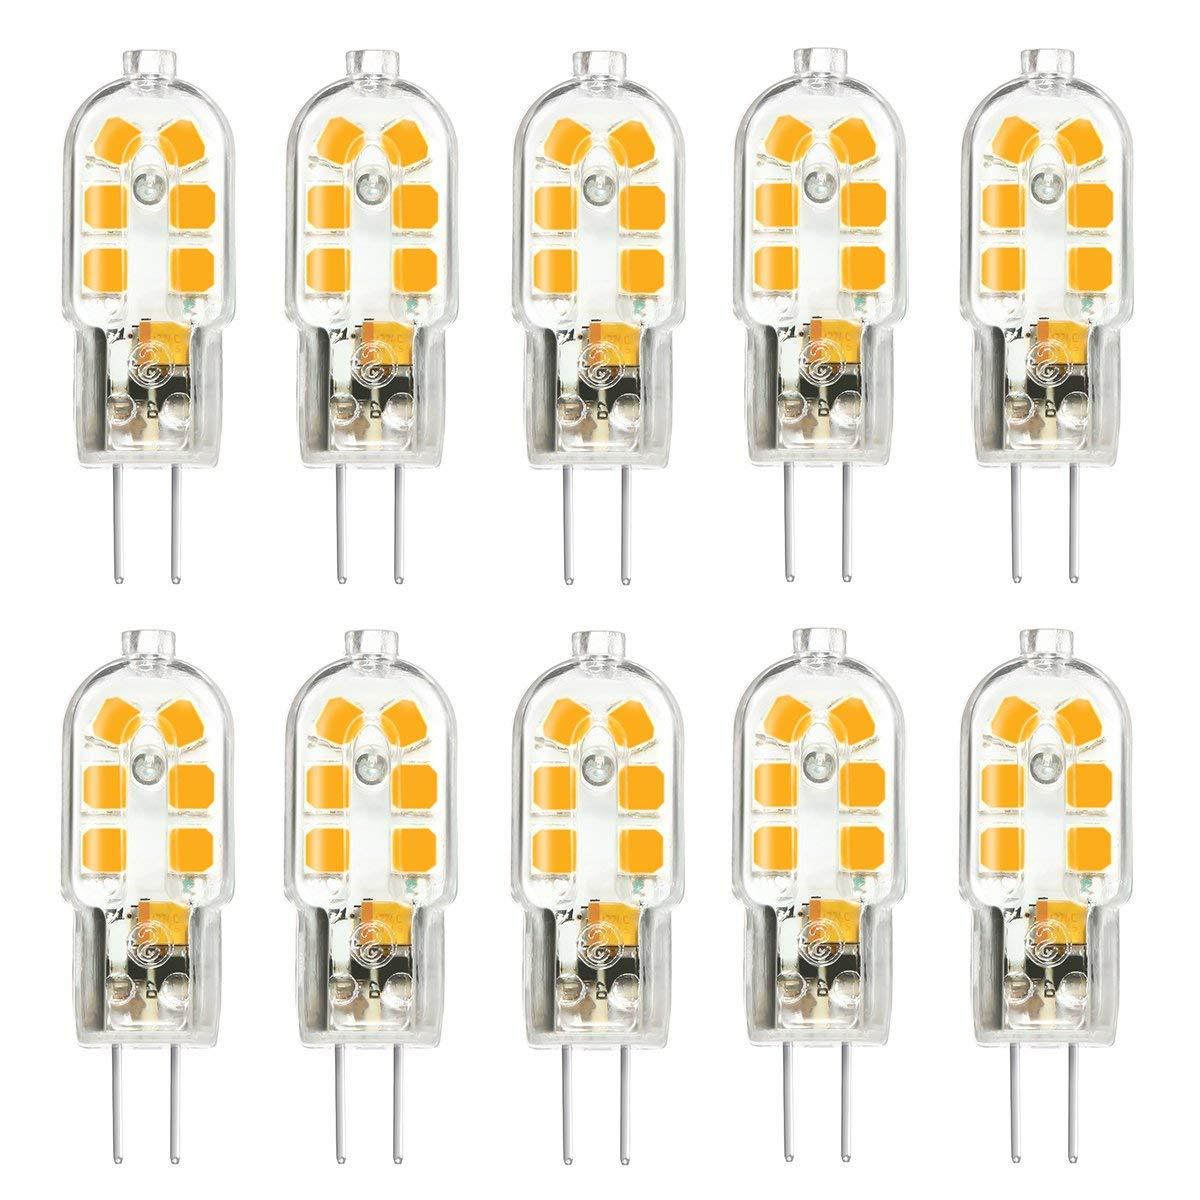 Us 14 95 12 Off G4 Led Bulb Bi Pin Base Corn Bulb 20w Halogen Bulb Equivalent Ac Dc 12volt Ac 220v Warm White 3000k Energy Class A 10pack In